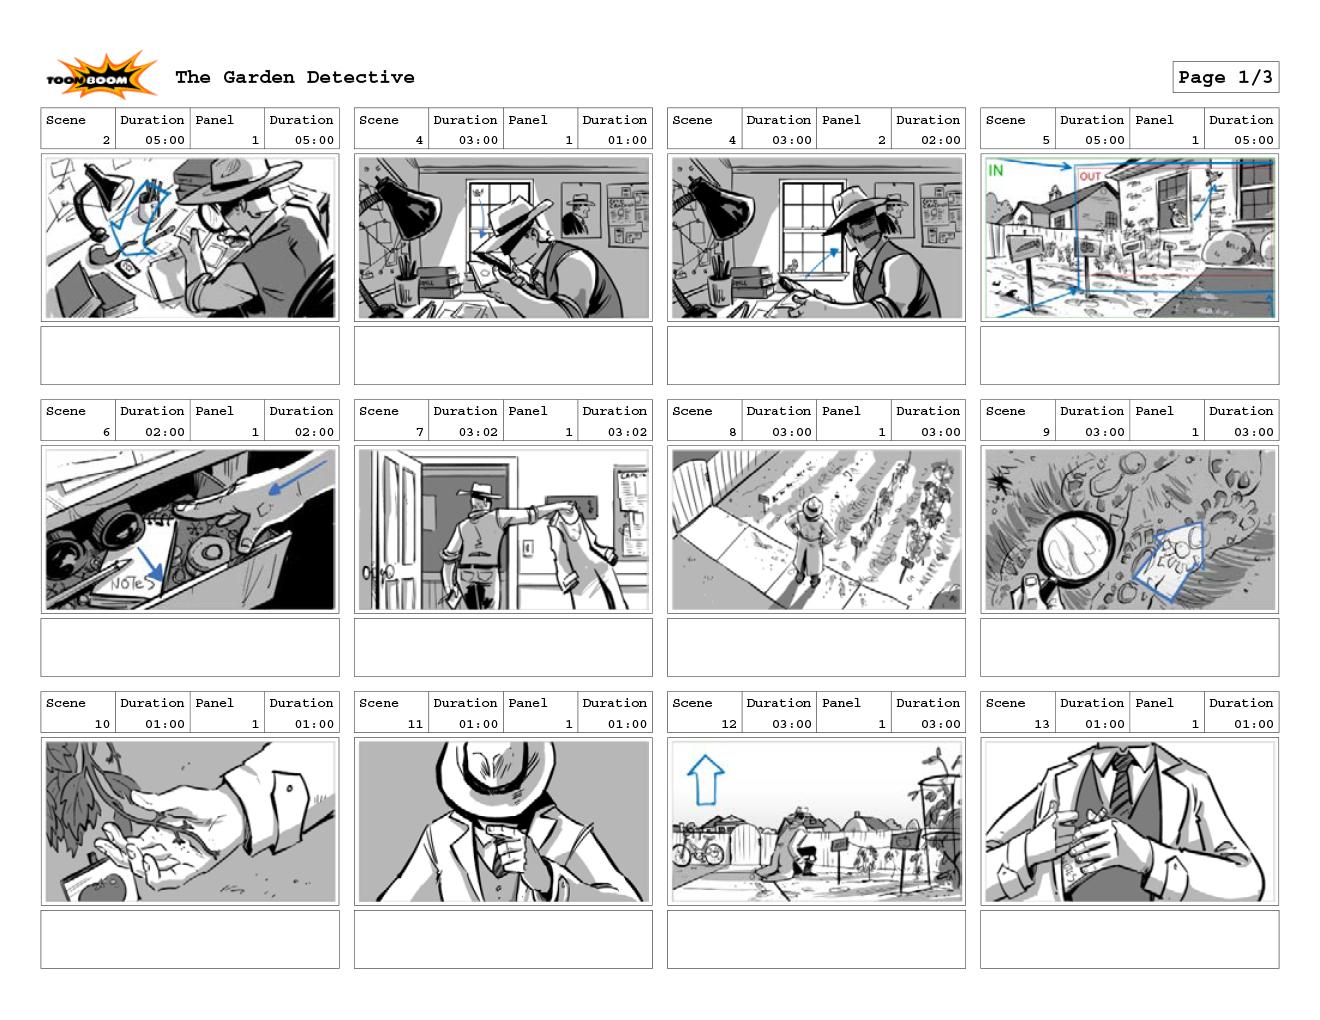 garden detective storyboards